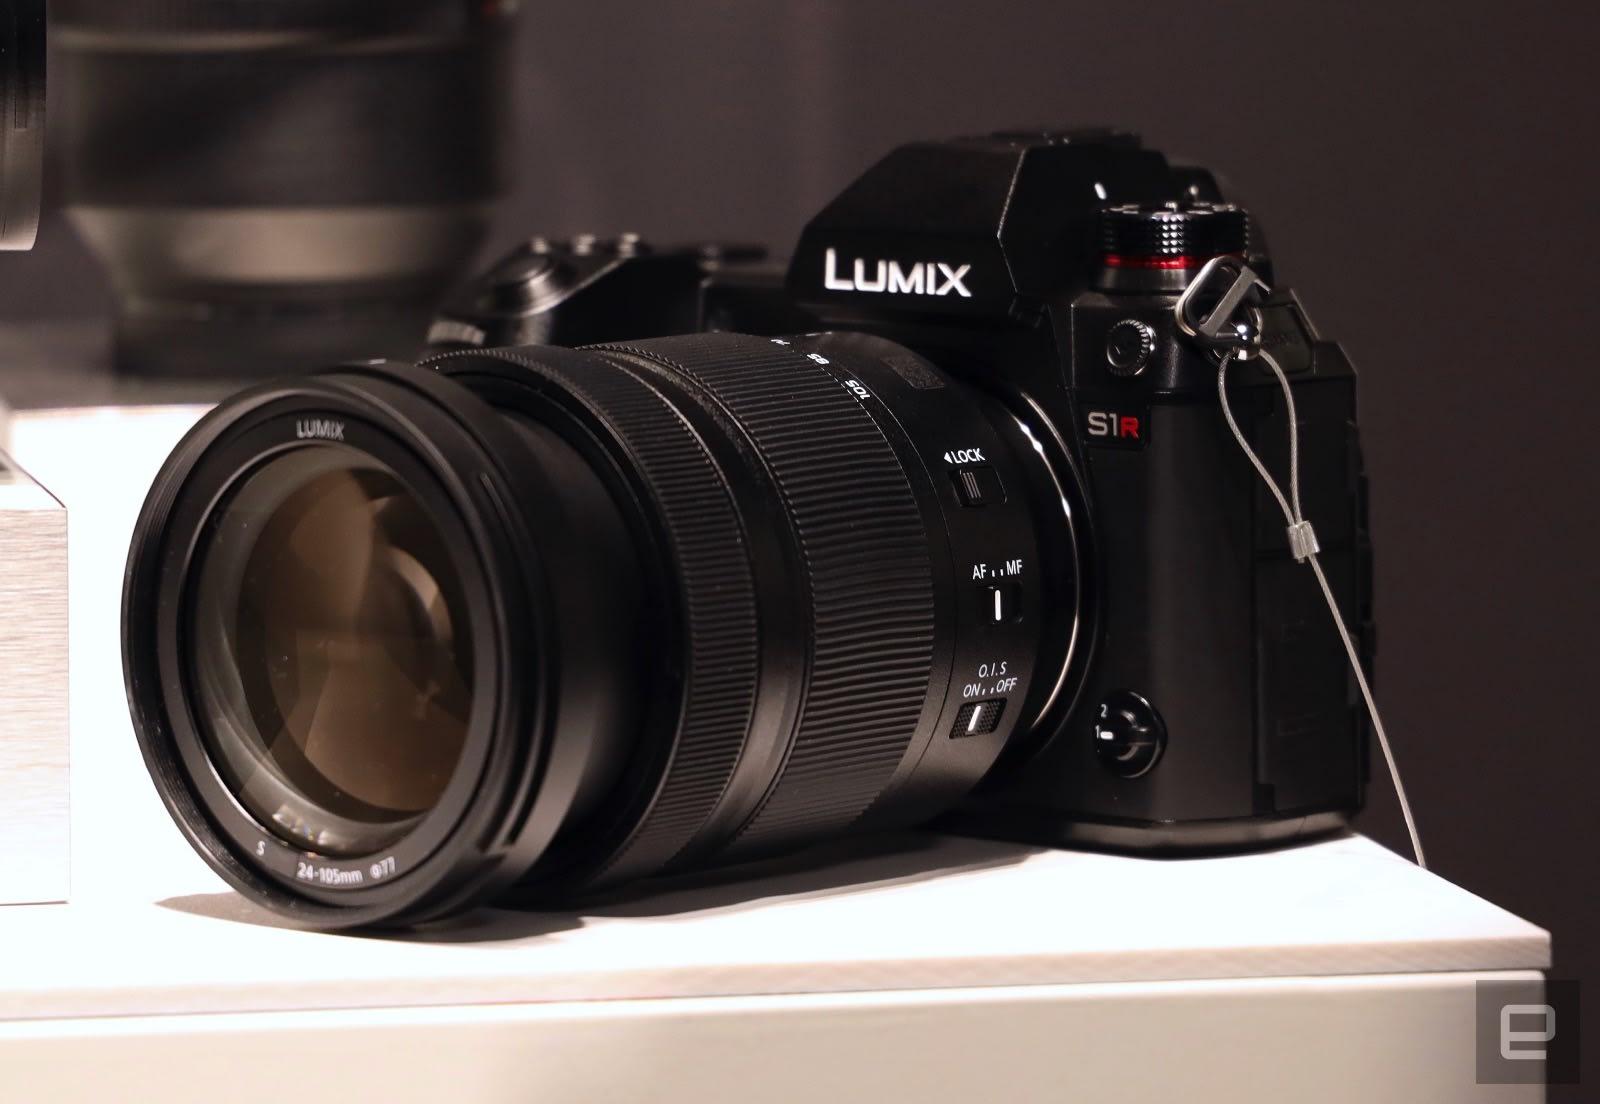 Panasonic Announces Two Full Frame L Mount Mirrorless Cameras